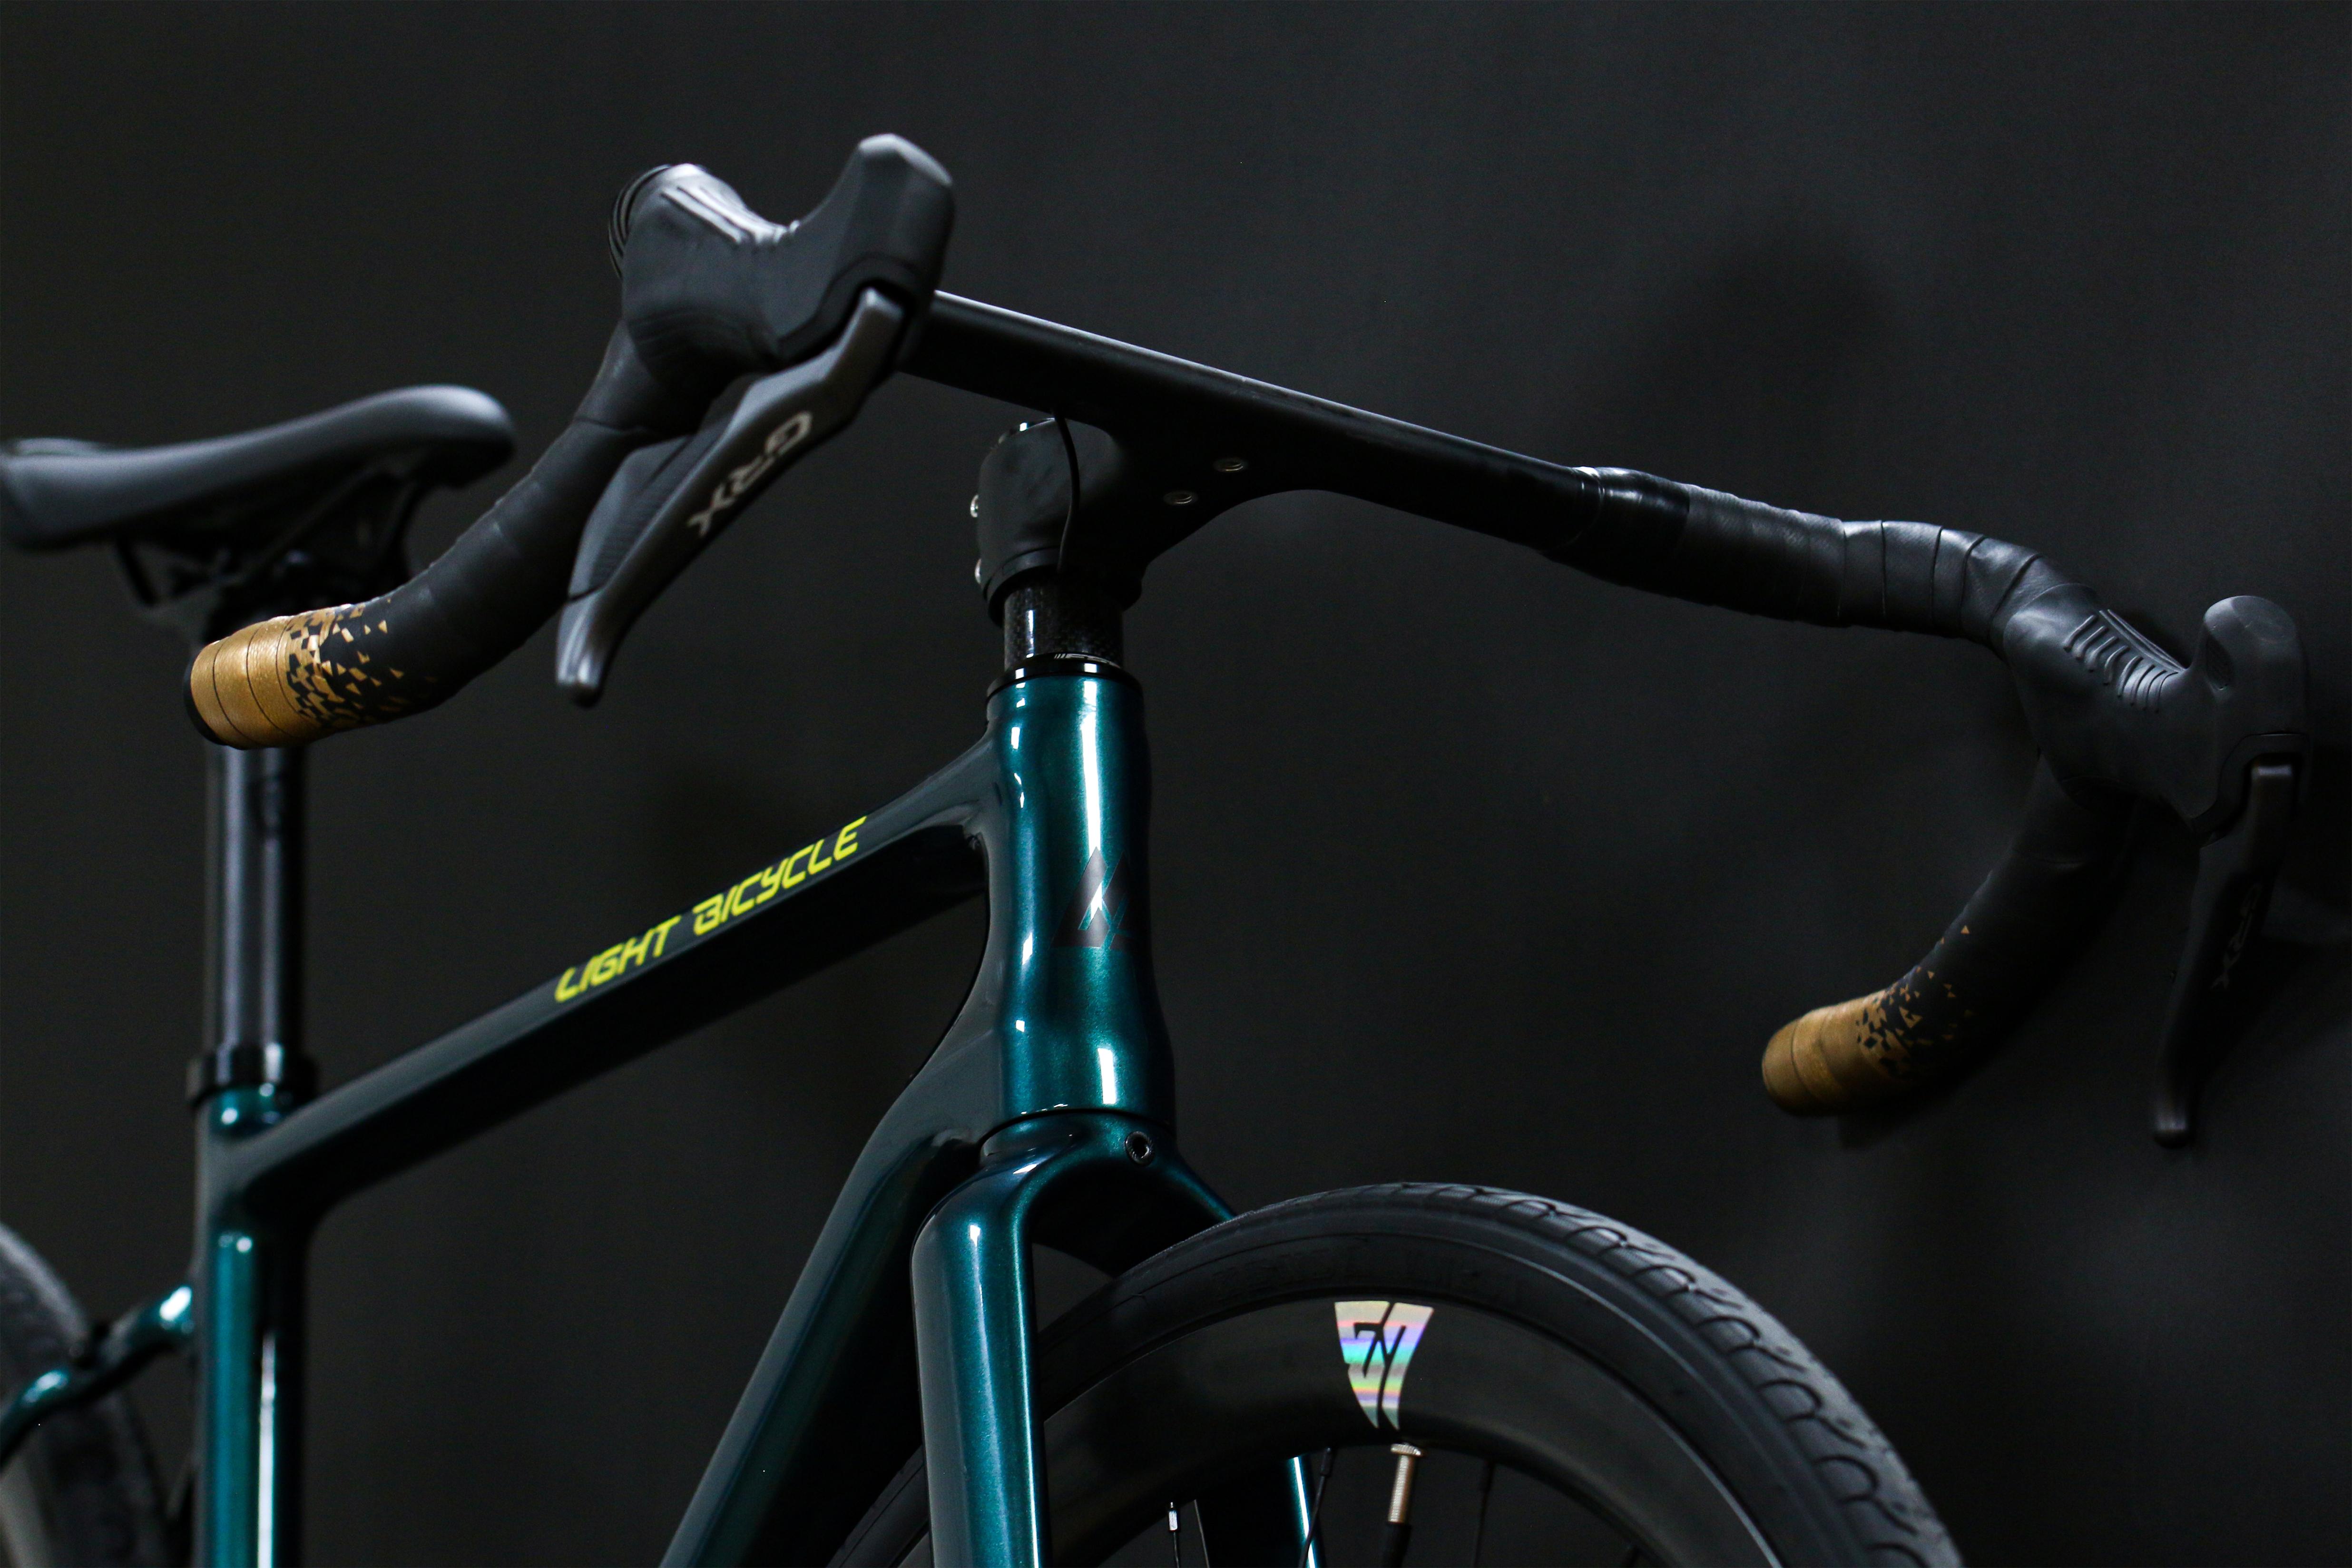 light-bicycle-journey-carbon-gravel-adventure-bike-build